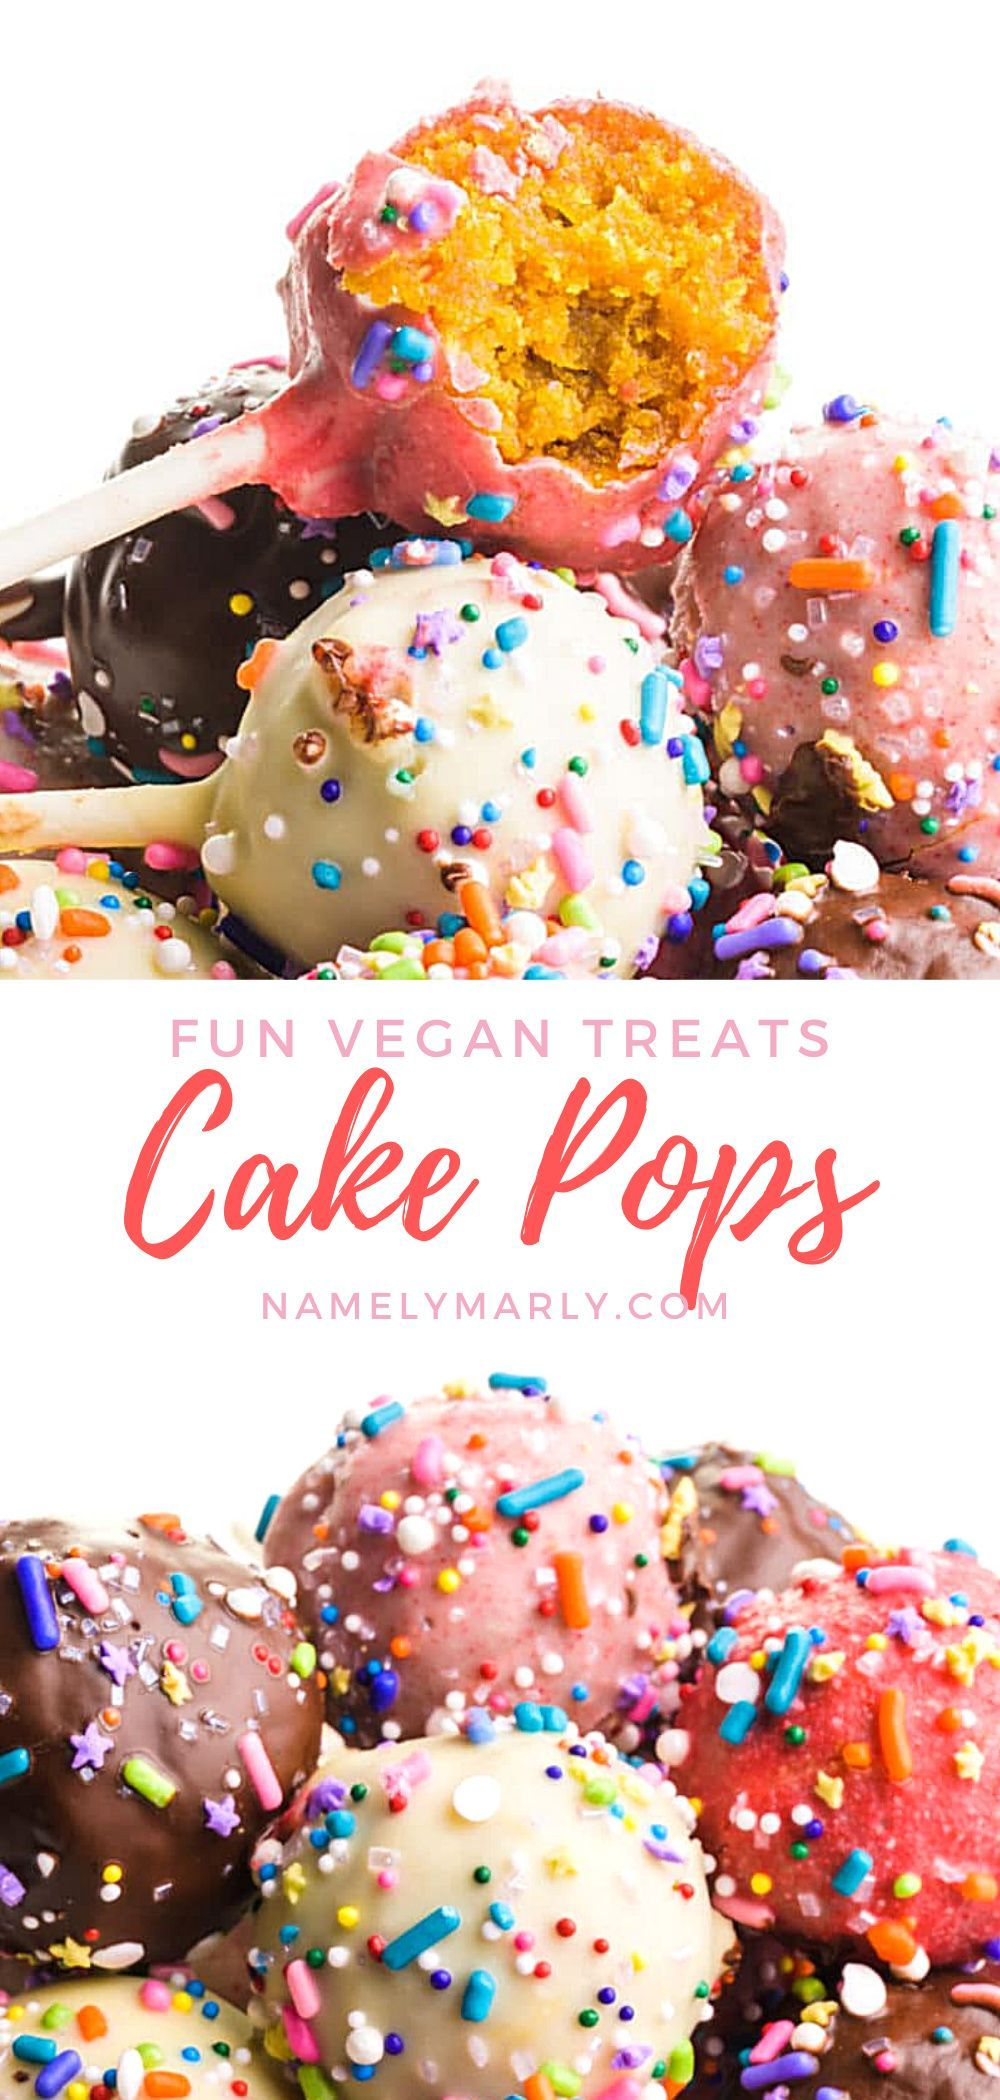 Cake Pops Made Vegan And Dairy Free In 2020 Vegan Cake Pops Recipe Cake Pop Recipe Vegan Cake Pops